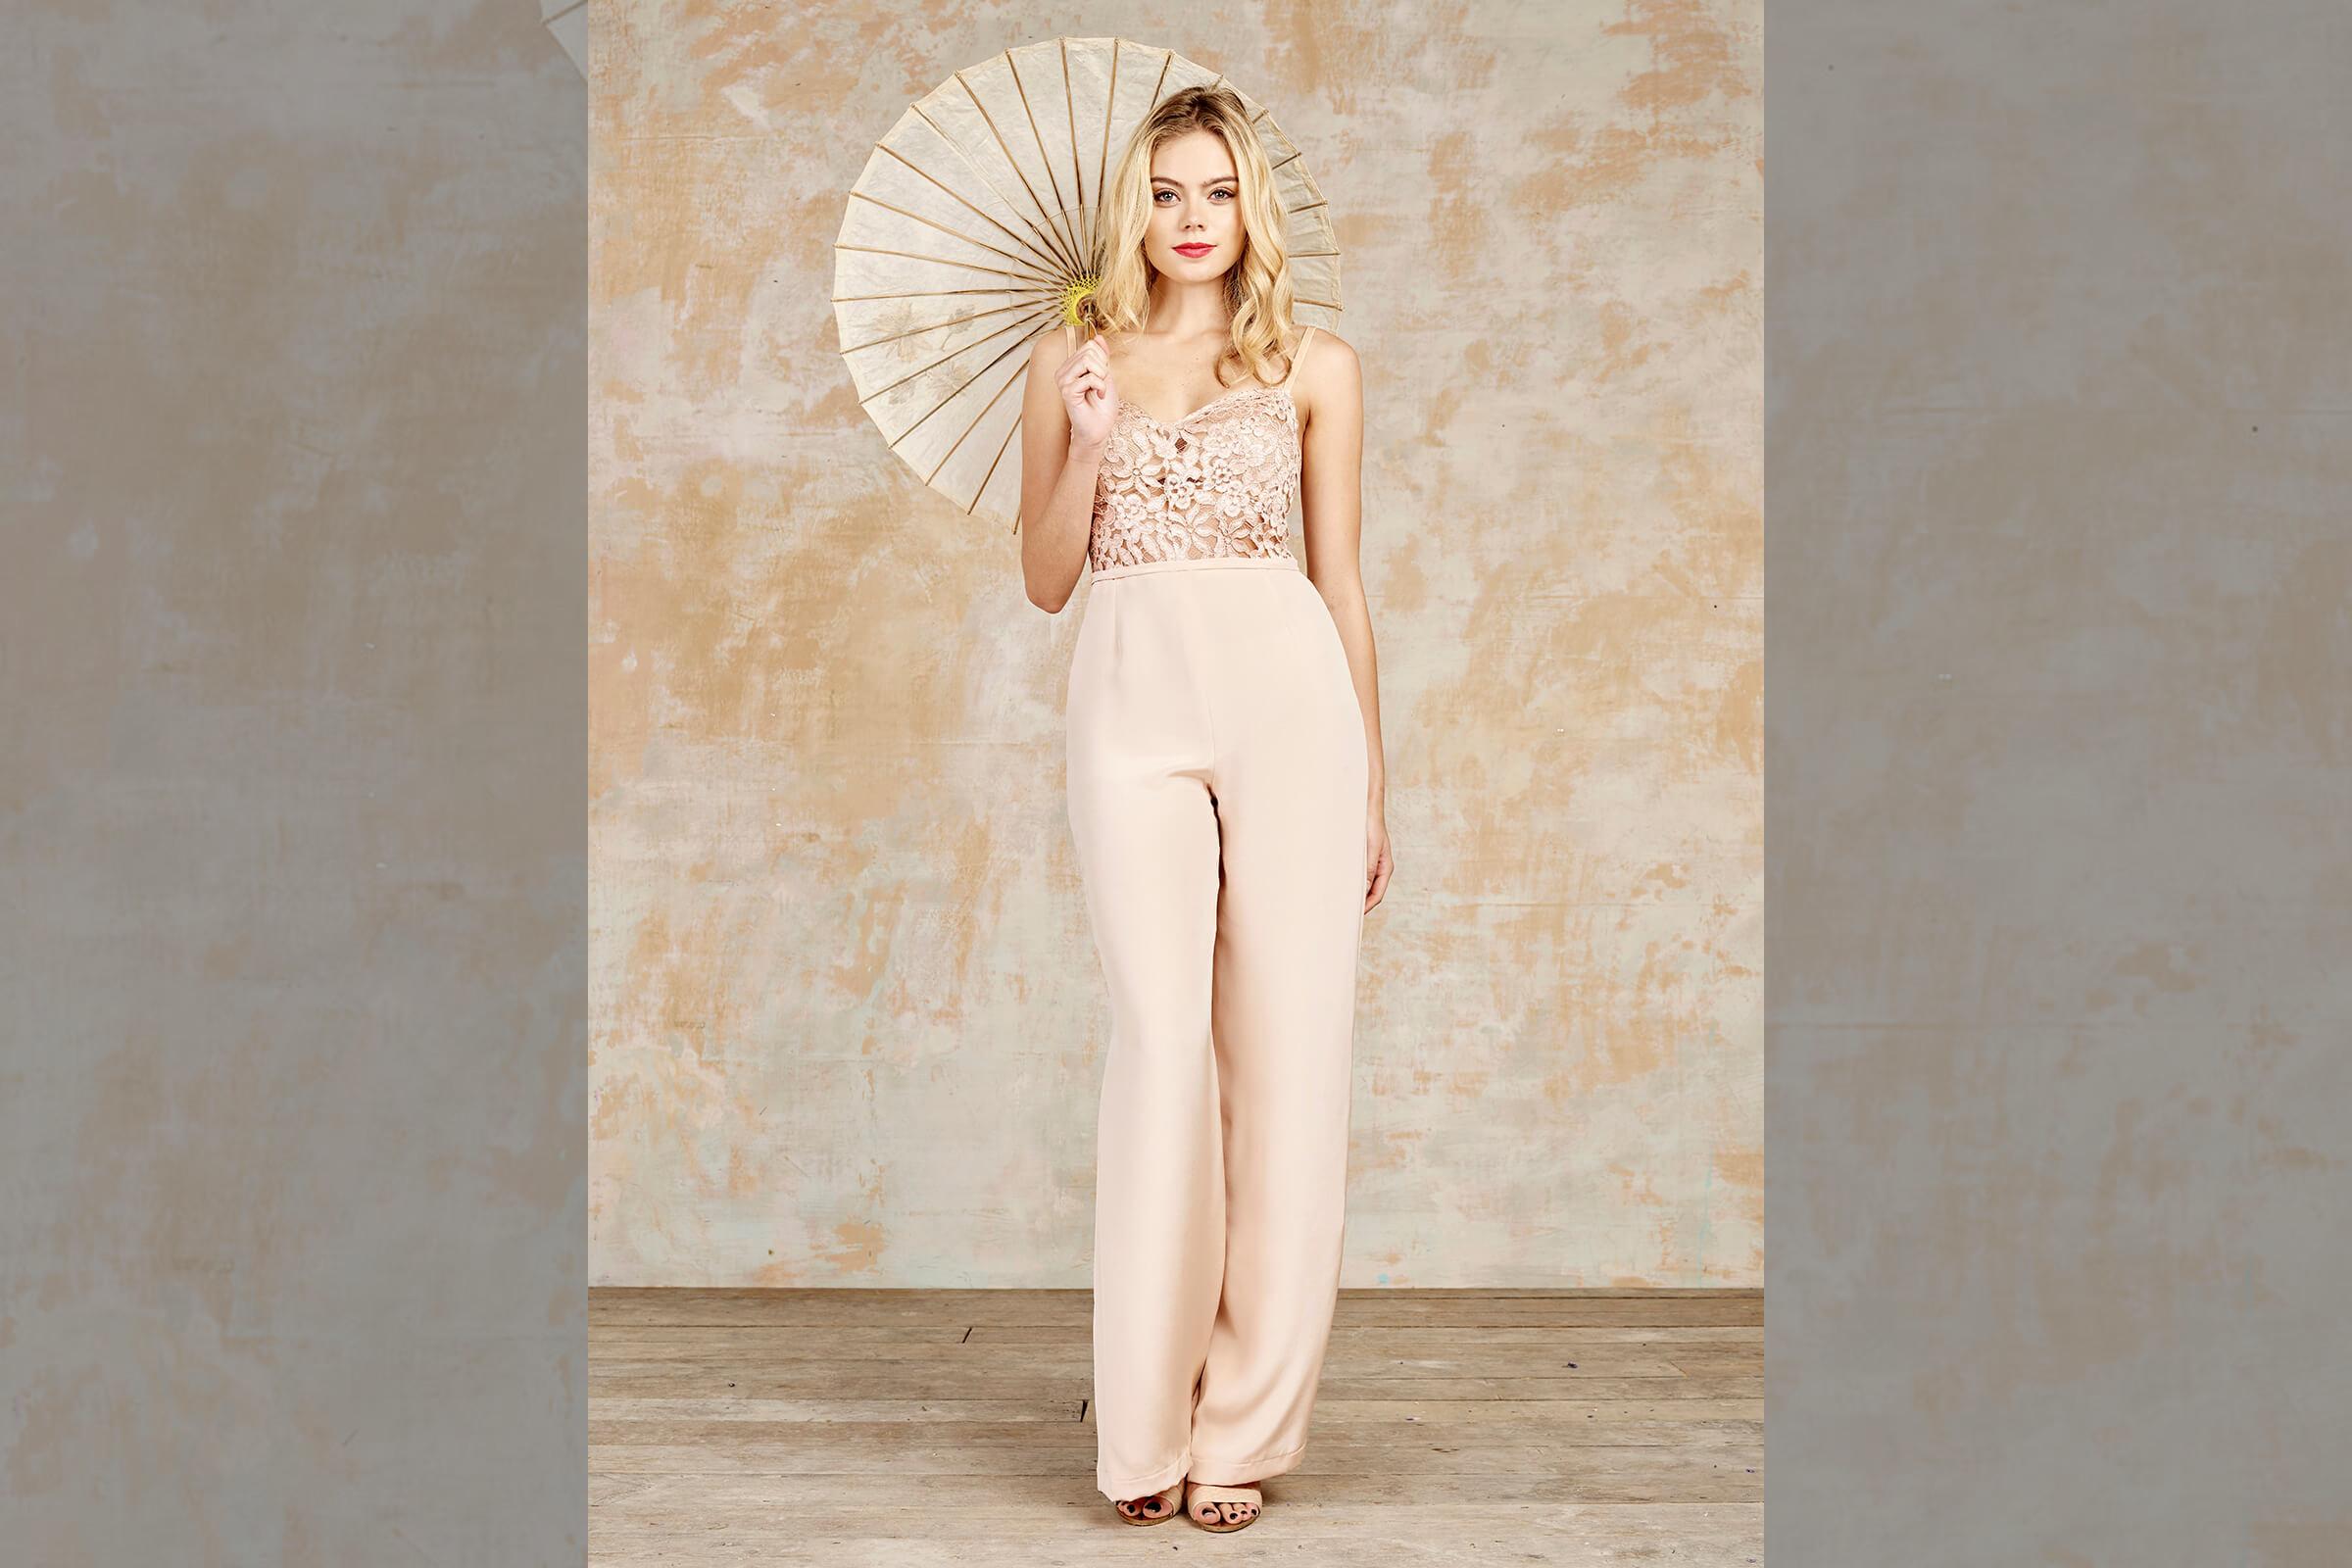 bridebook.co.uk-house-of-ollichon blush jumpuit model with parasol